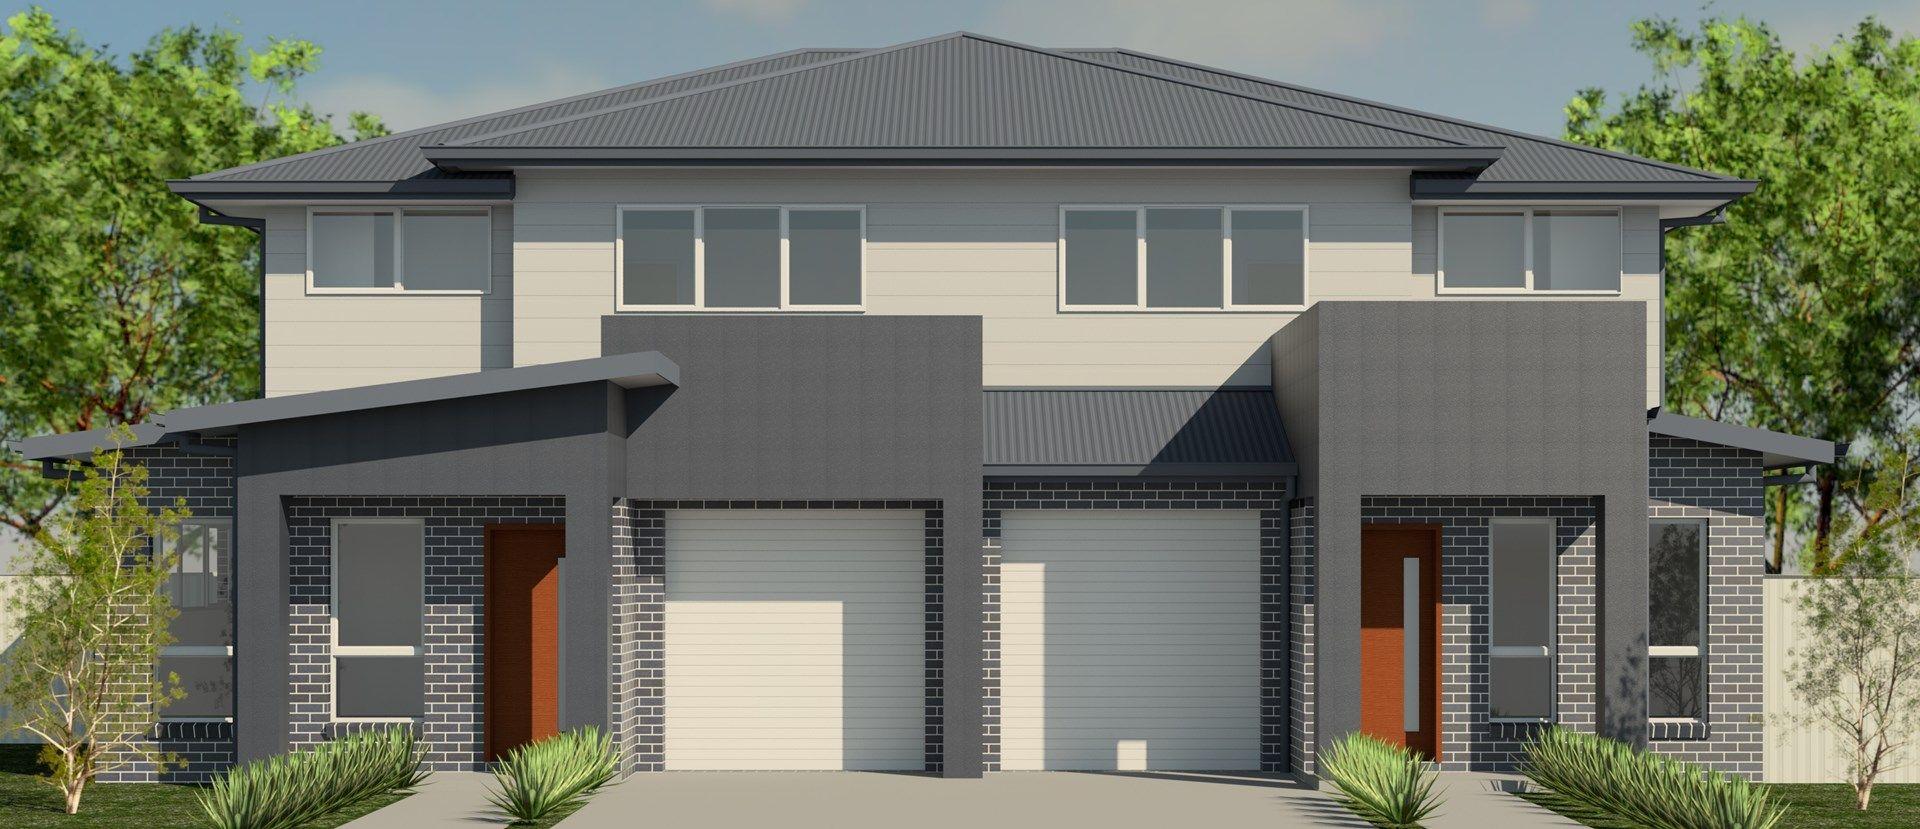 Lot 1 at 12 Hinton Loop, Oran Park NSW 2570, Image 0